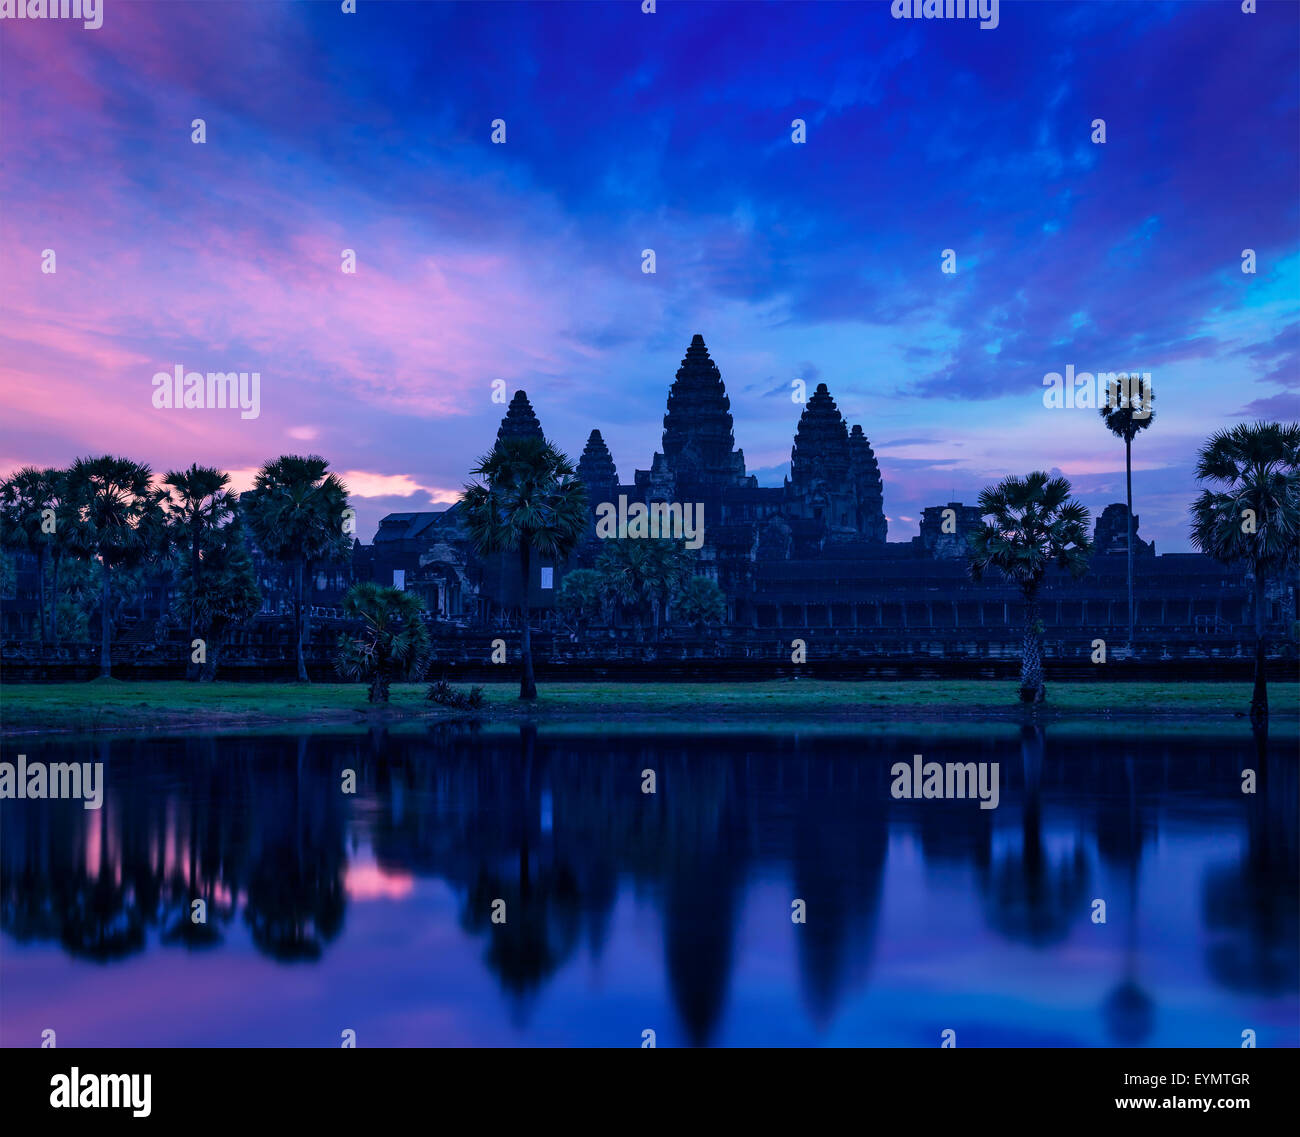 Angkor Wat - famous Cambodian landmark - on sunrise. Siem Reap, Cambodia - Stock Image